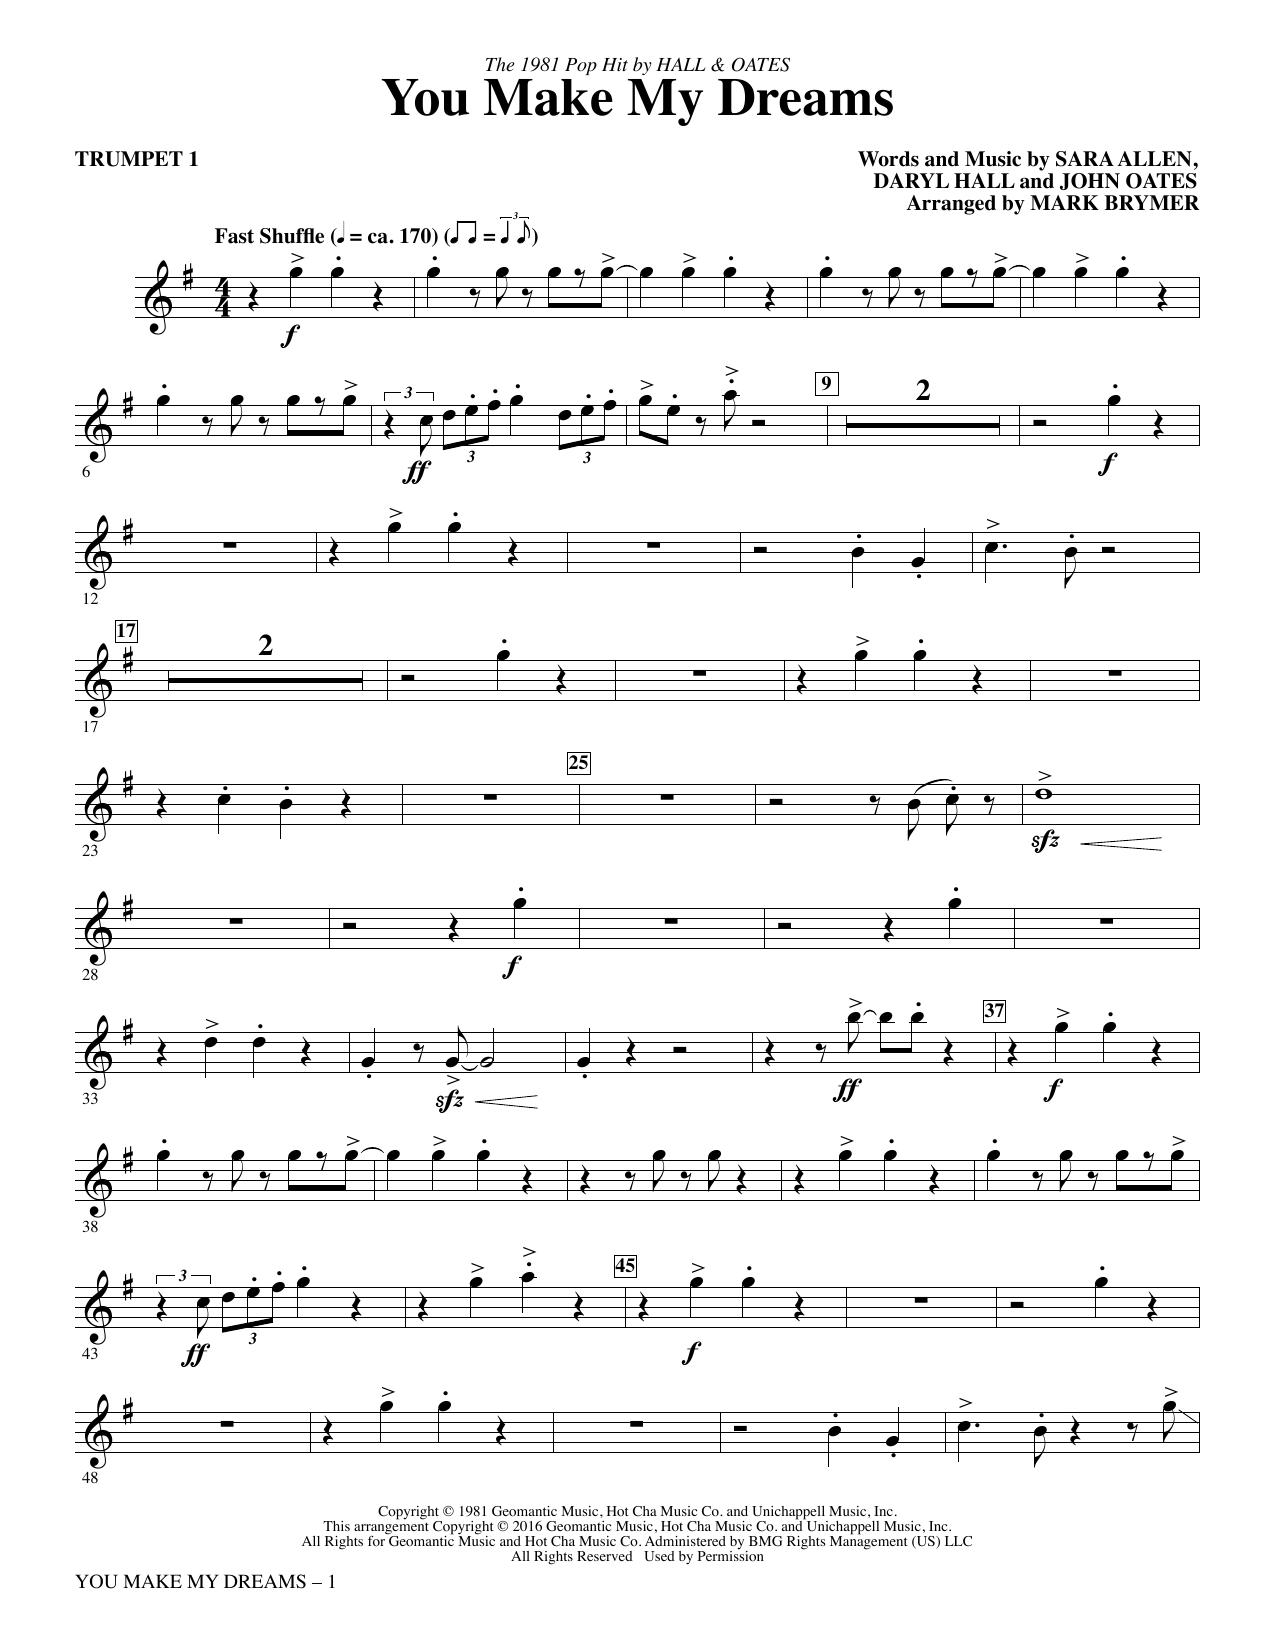 Daryl Hall & John Oates - You Make My Dreams - Trumpet 1